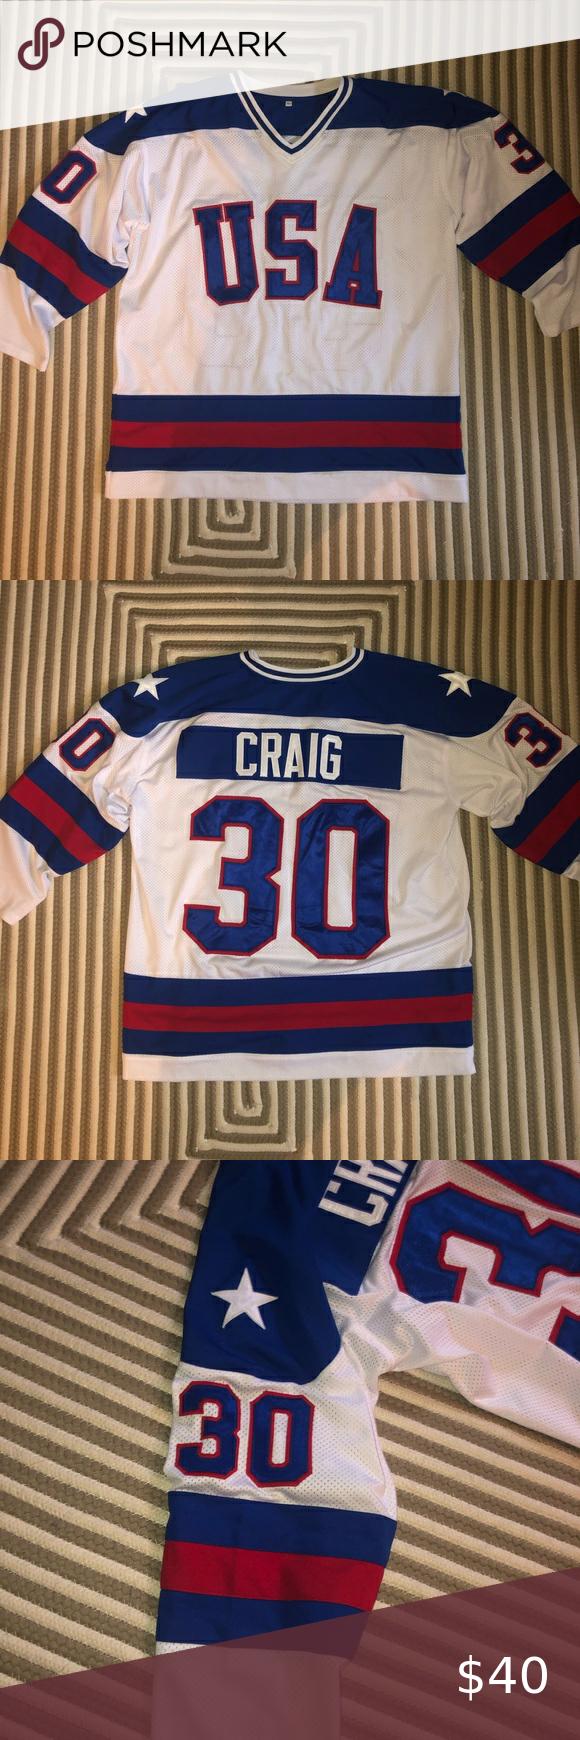 1980 Team Usa Hockey Jersey Jimmy Craig In 2020 Team Usa Hockey Hockey Outfits Usa Hockey